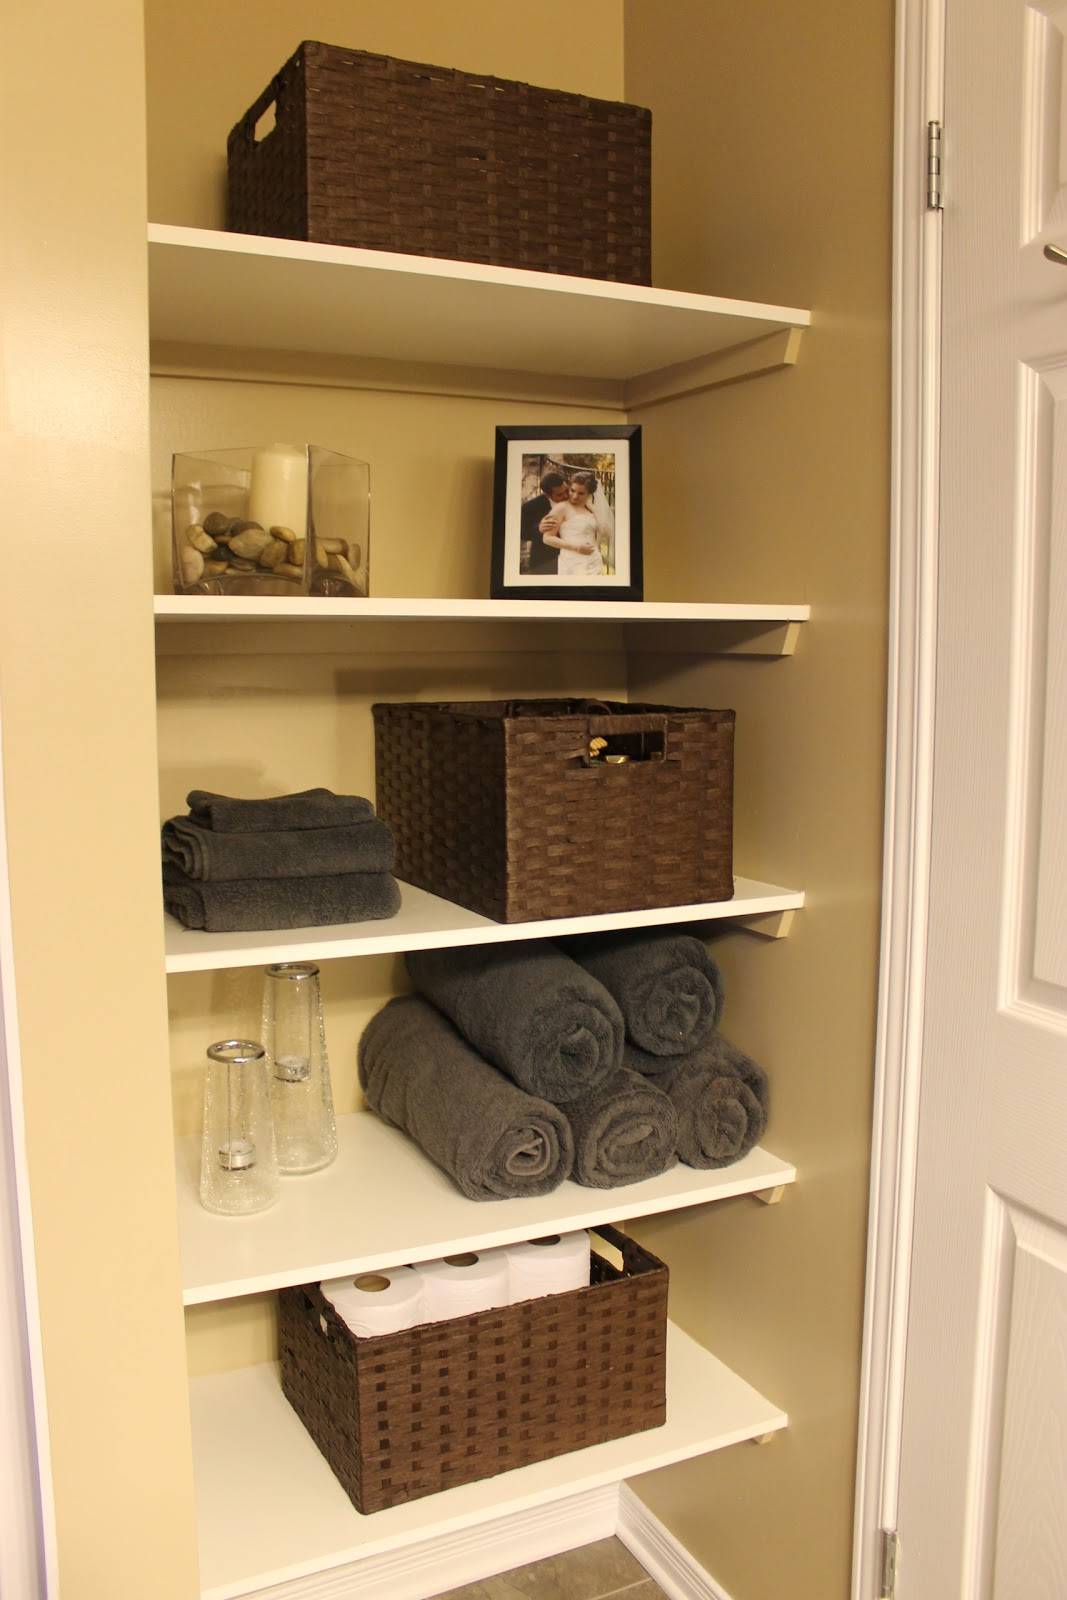 KM Decor DIY Organizing Open Shelving in a Bathroom